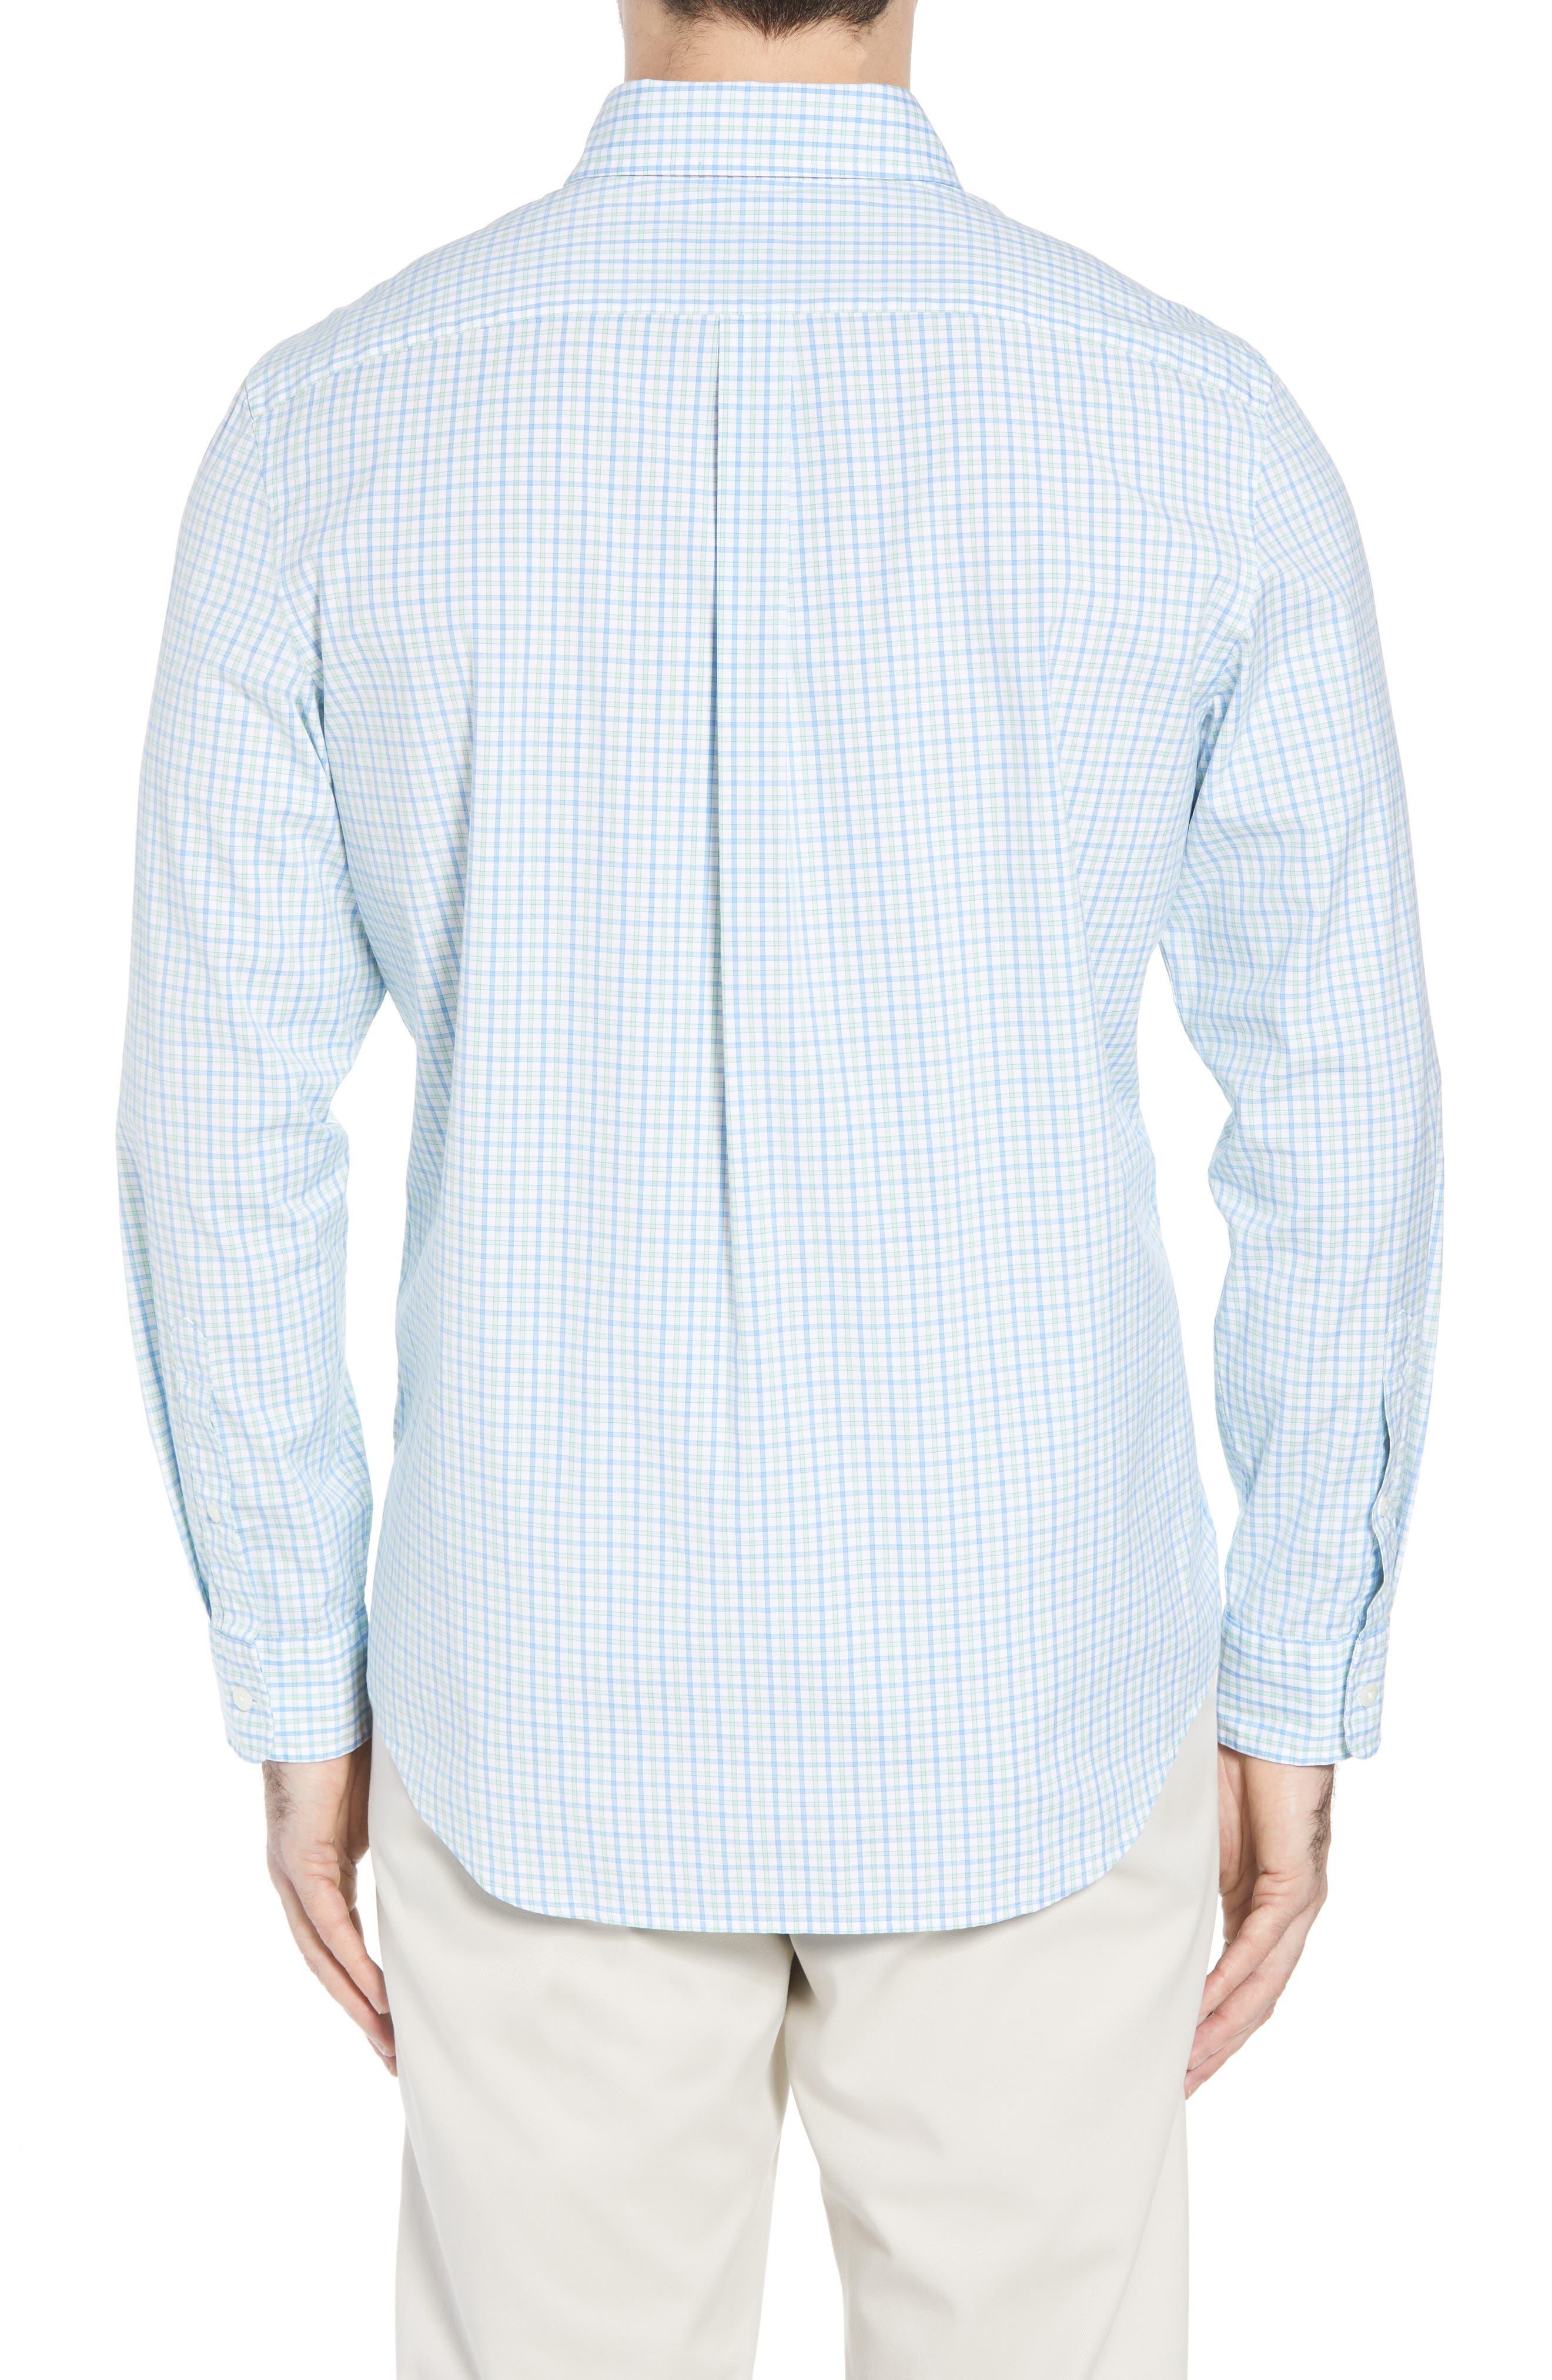 Clark Cove Tucker Classic Fit Check Sport Shirt,                             Alternate thumbnail 2, color,                             305